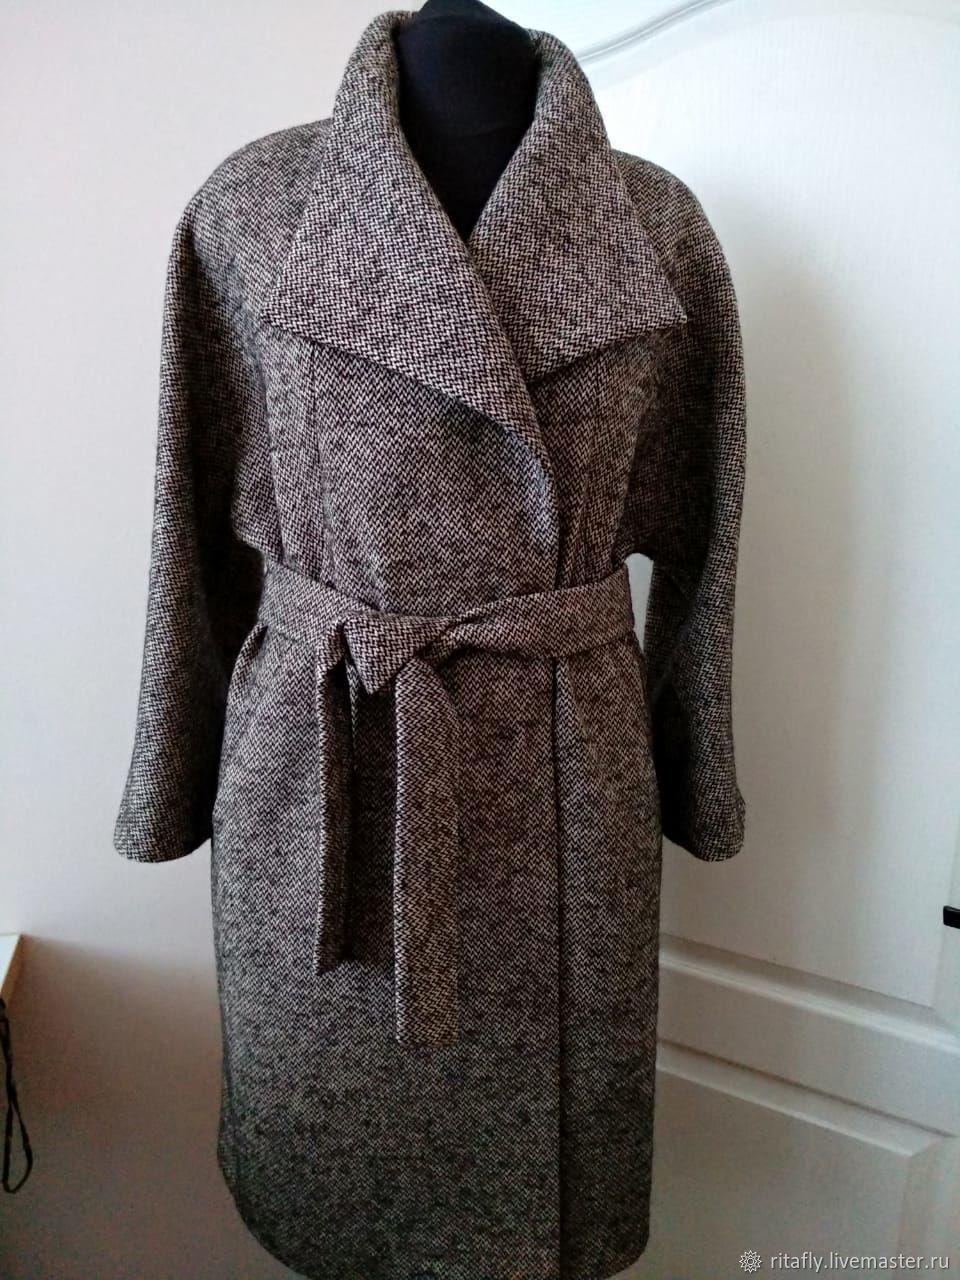 Copy of Copy of Copy of Copy of 346: bat coat oversize, Coats, Moscow,  Фото №1